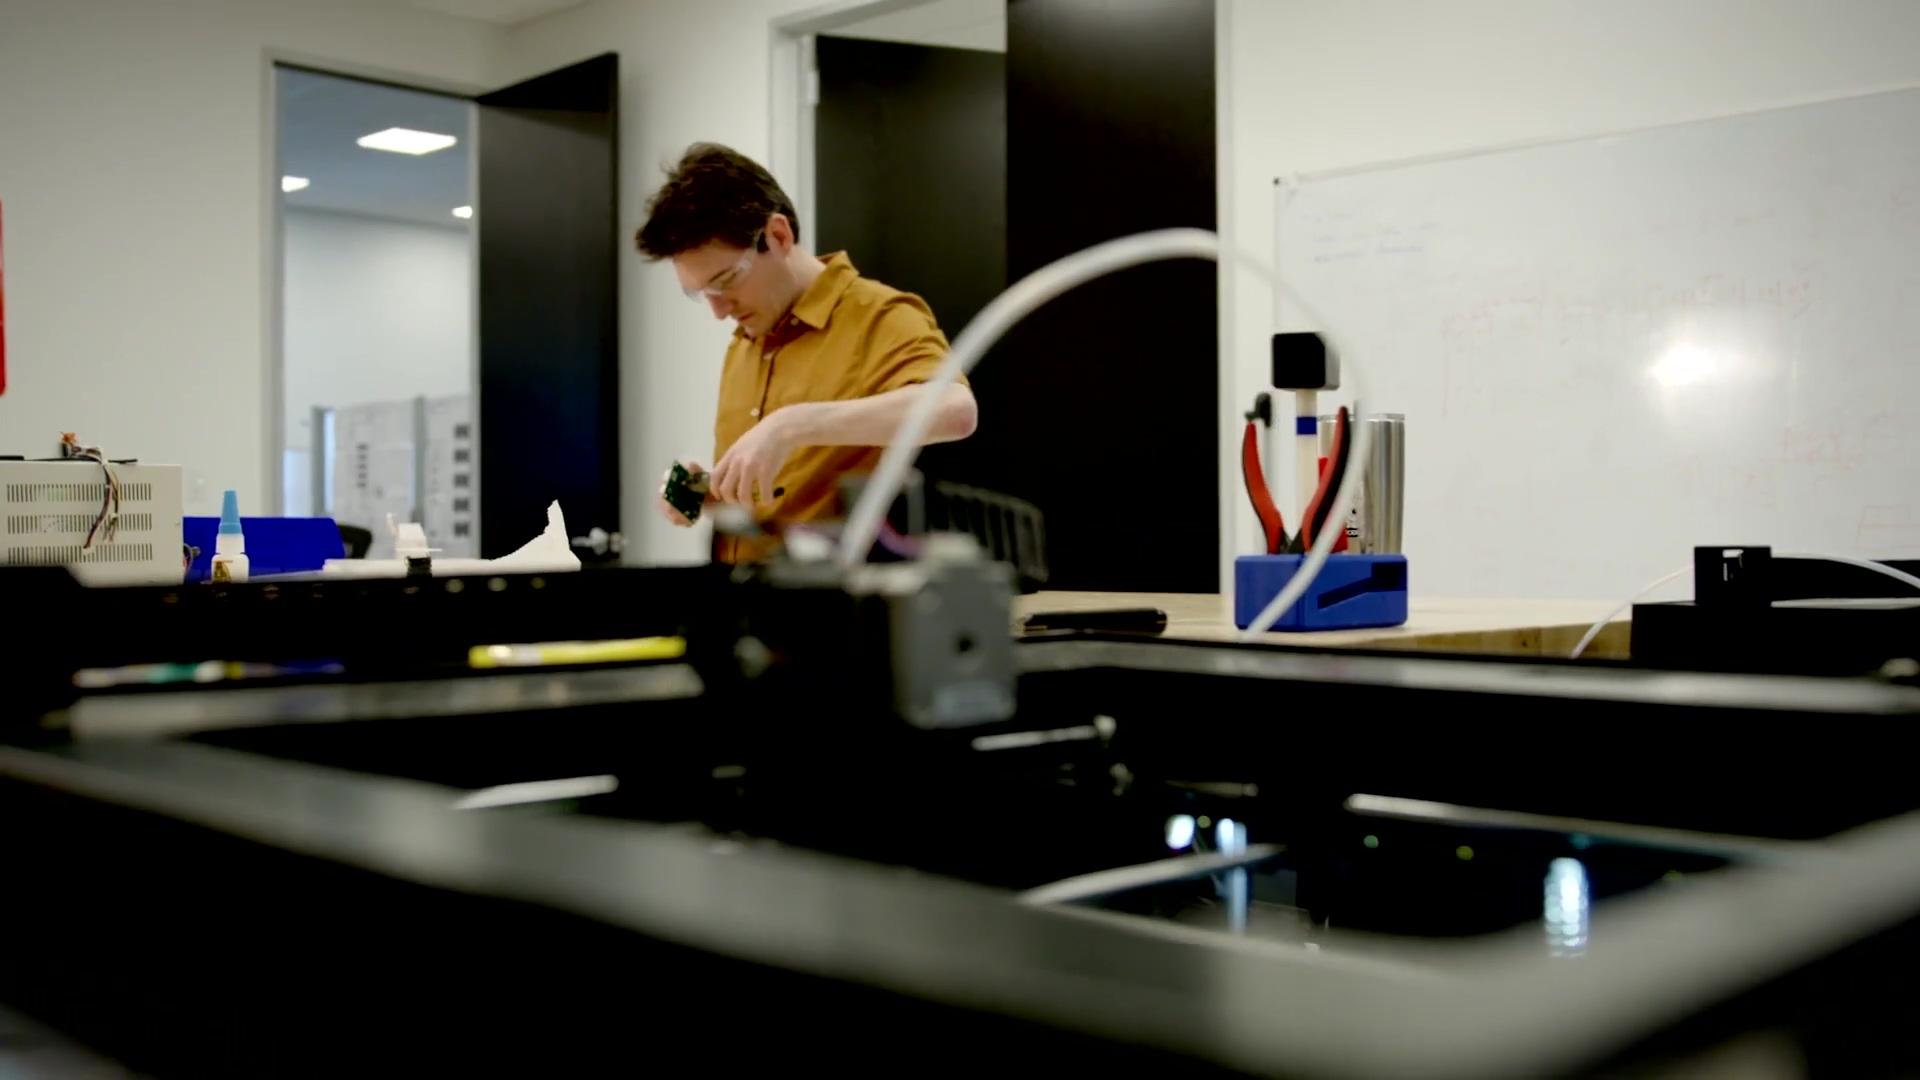 The Machine Tool of 3D Printers